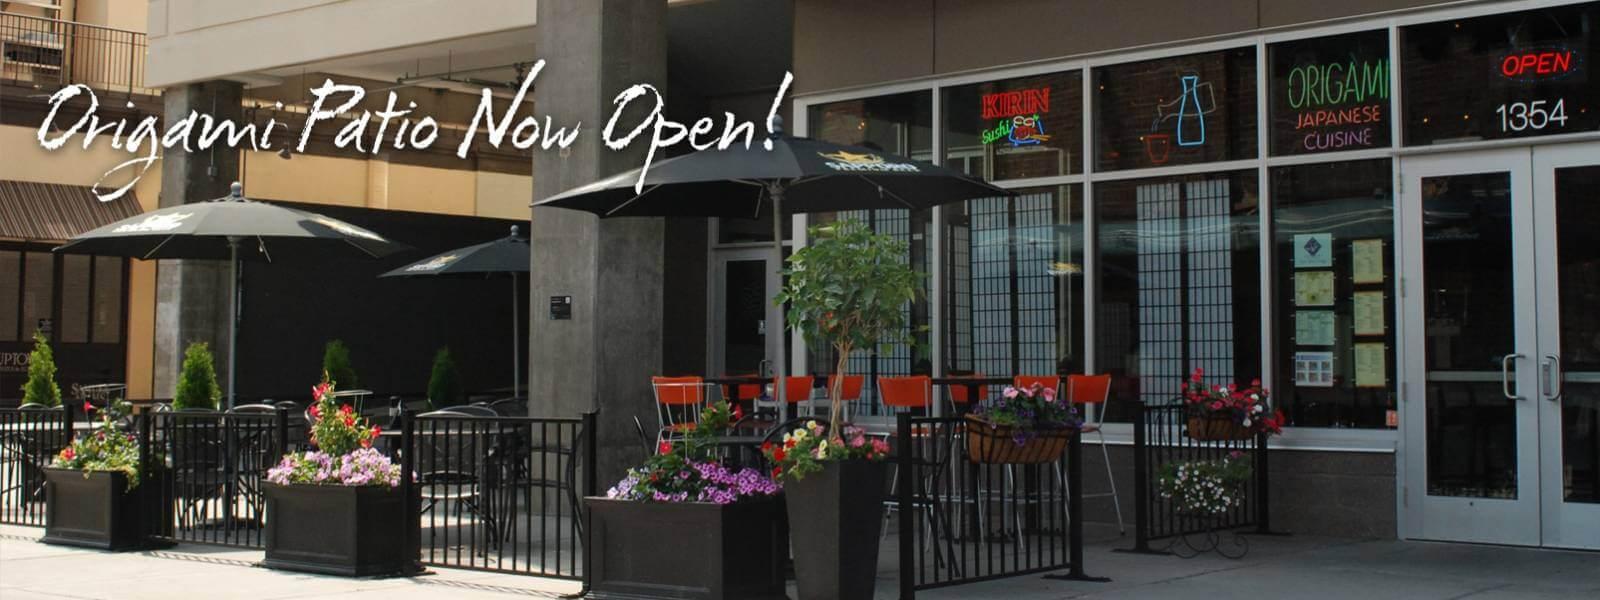 Patio Is Now Open!